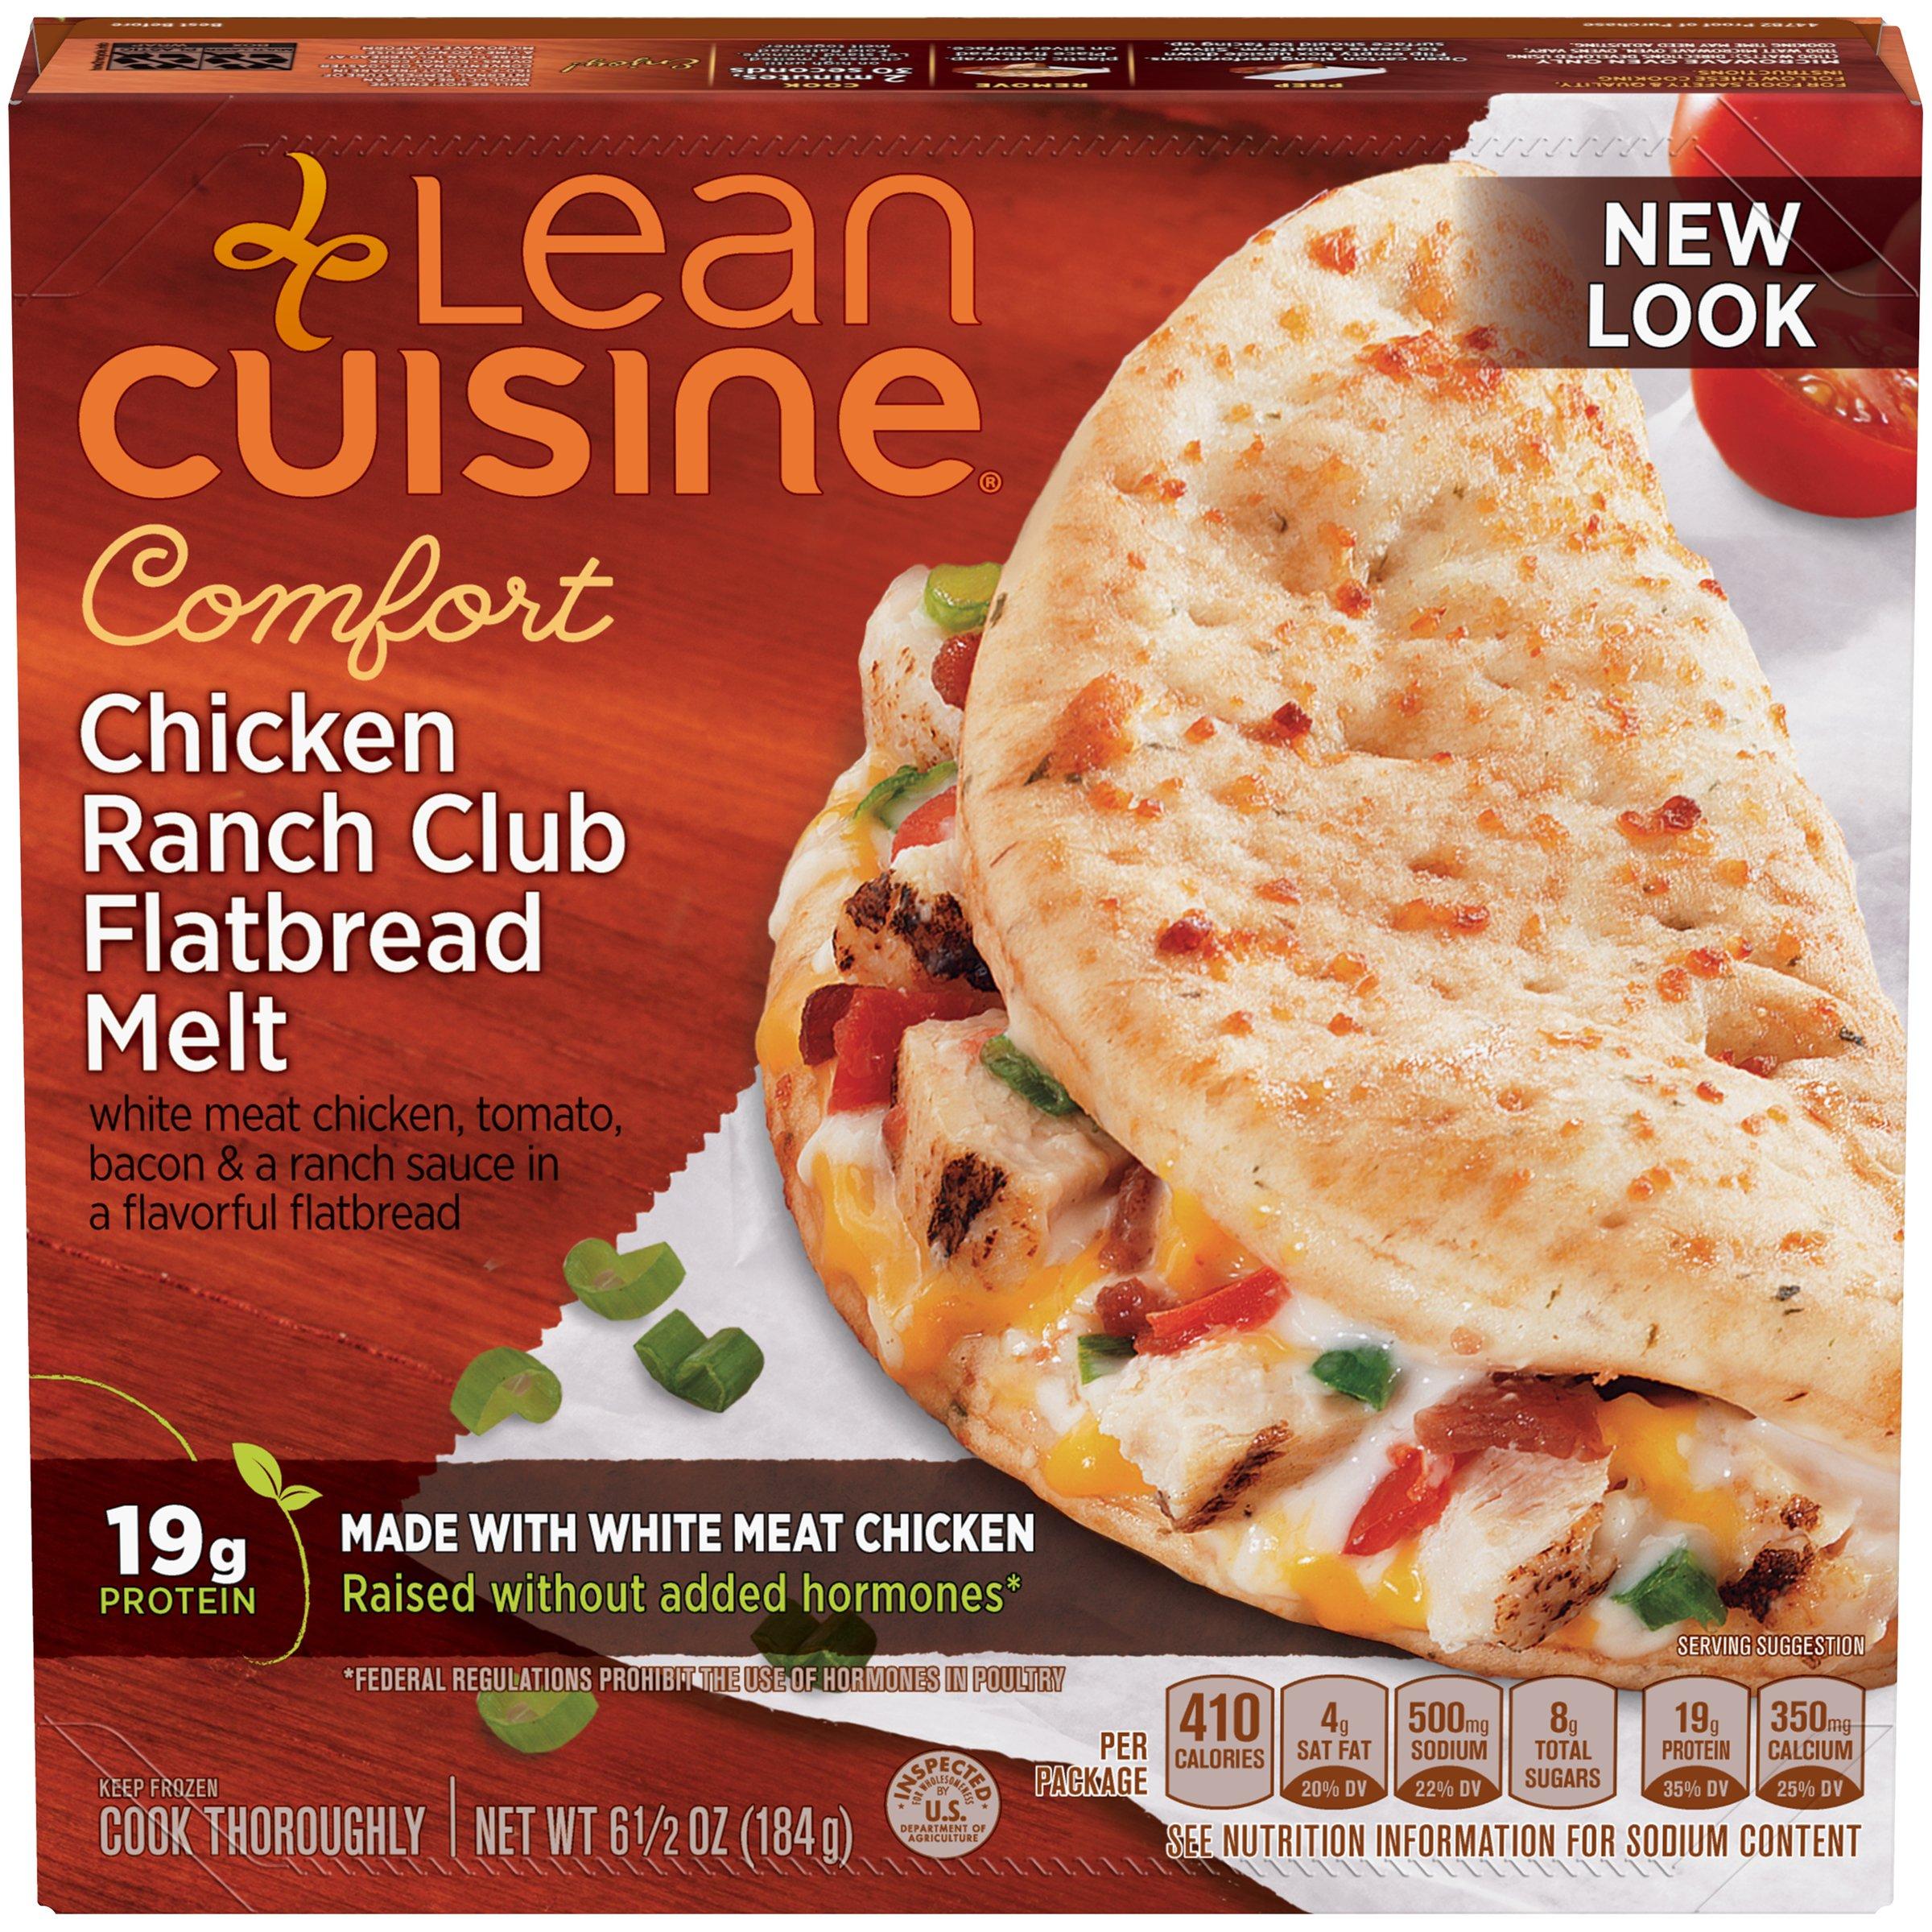 LEAN CUISINE COMFORT Chicken Ranch Club Flatbread Melt 6.5 oz. Box